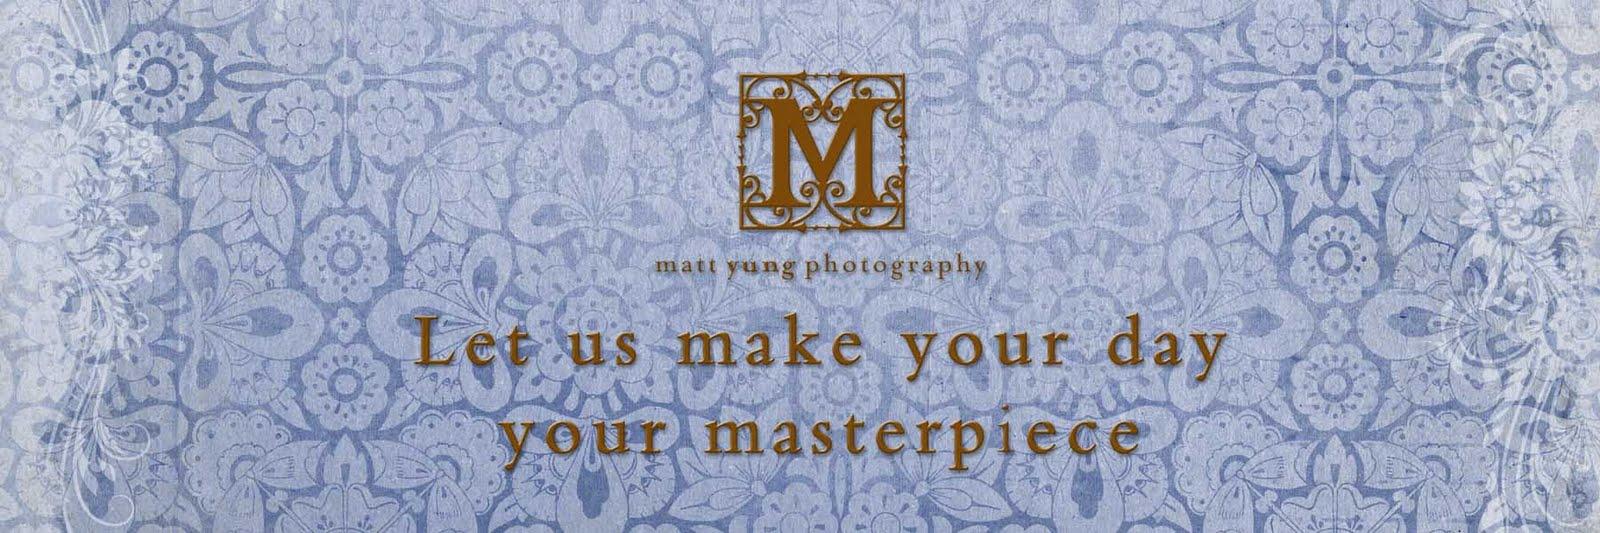 Matt Yung Photography